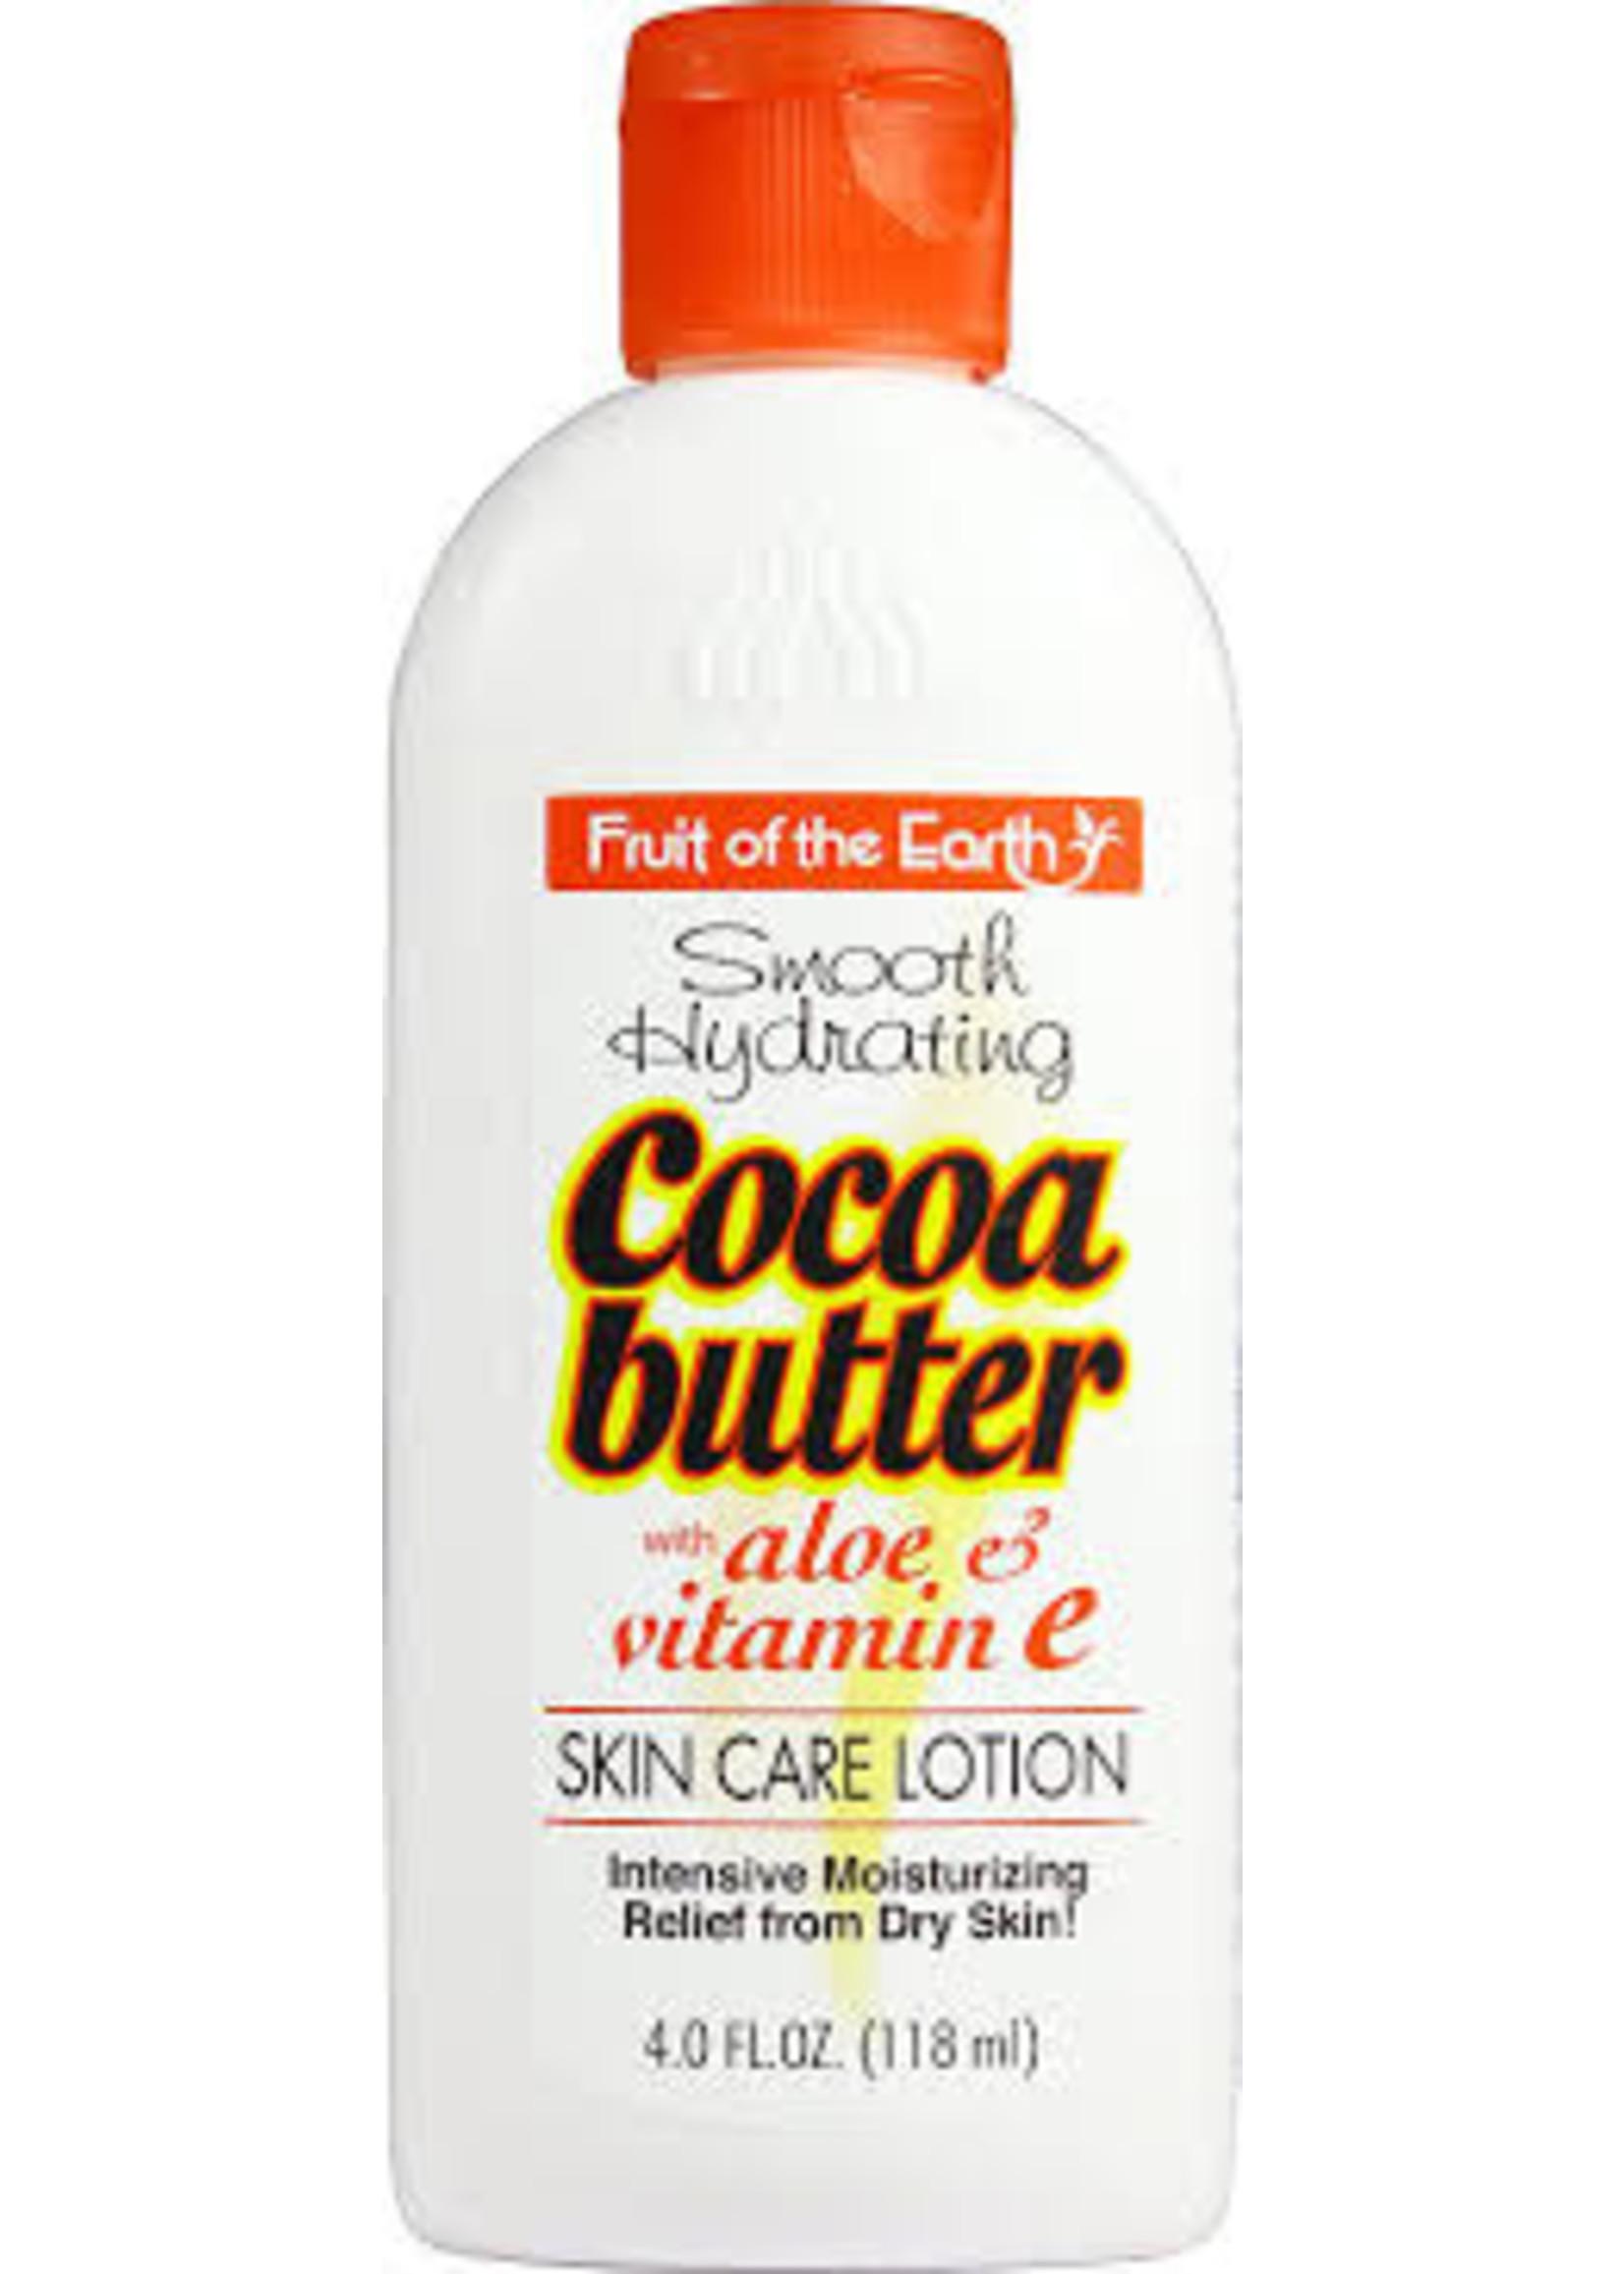 Fruit of the Earth Lotion CocoAloe